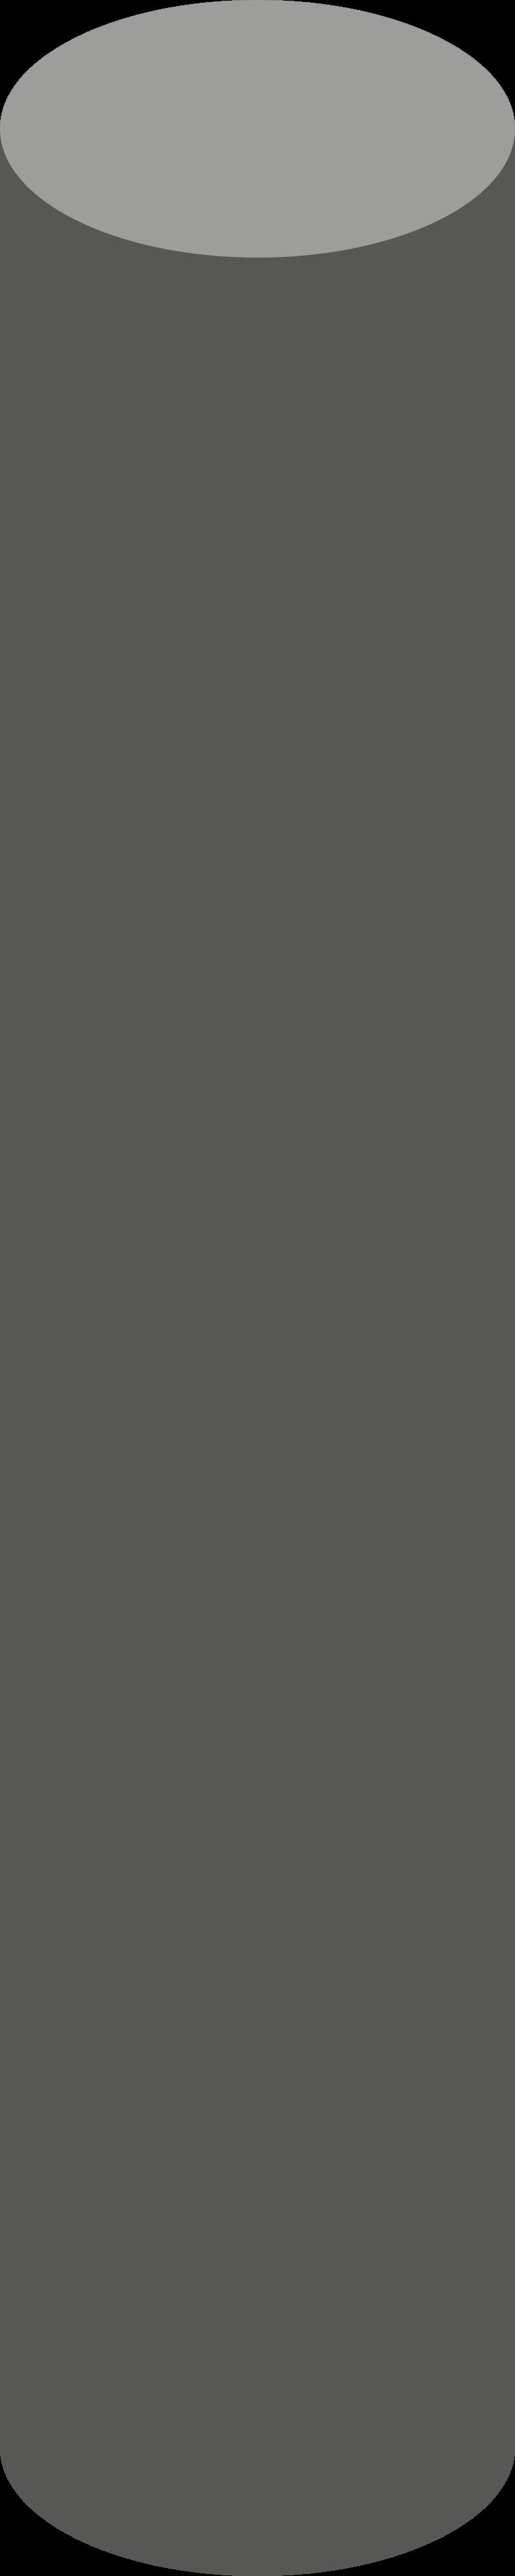 e elements histogram Clipart illustration in PNG, SVG